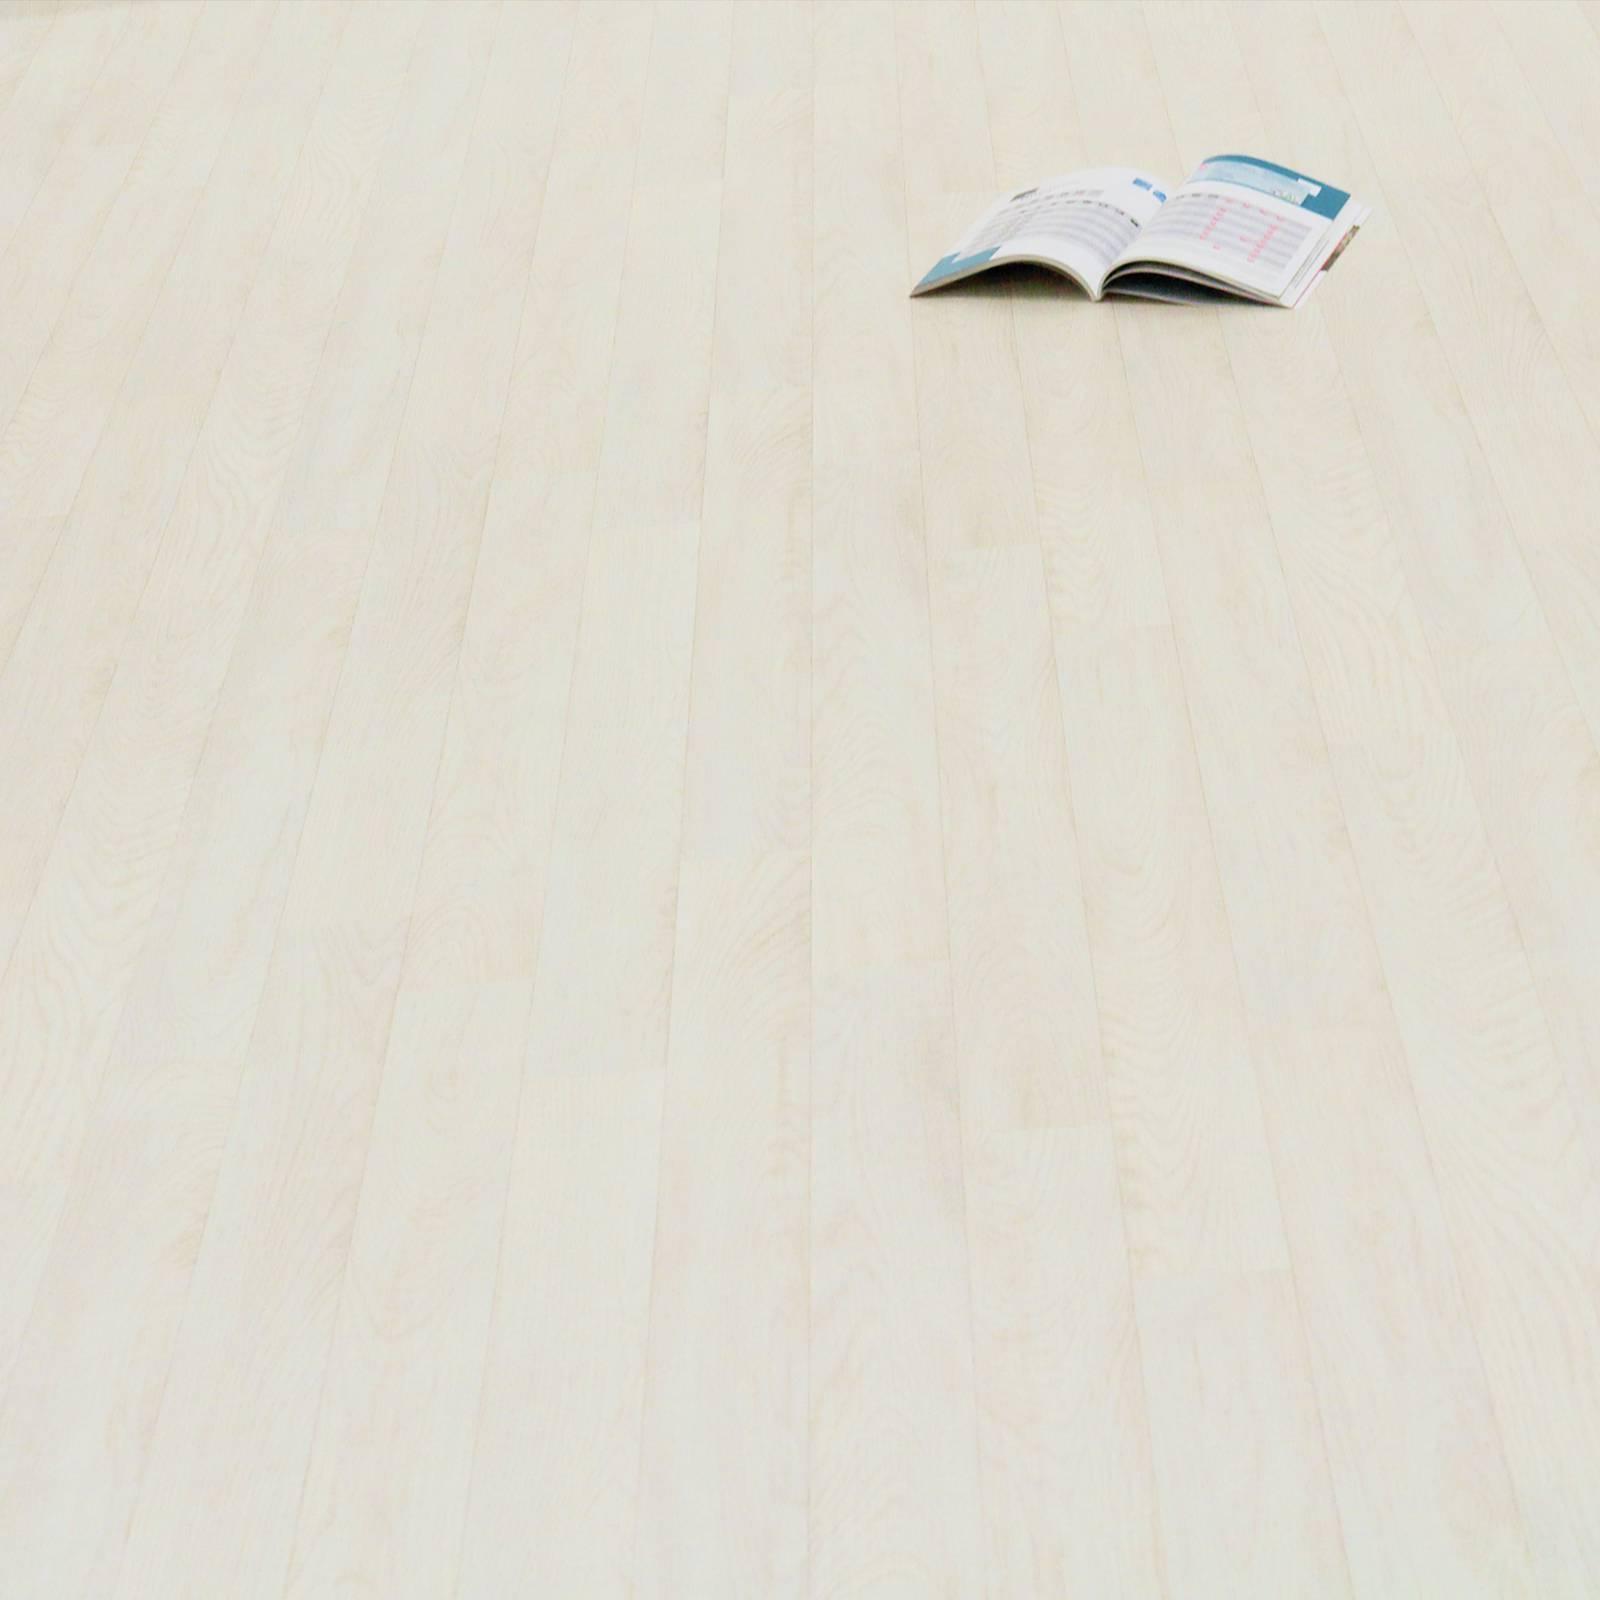 PVC Bodenbelag Holz Planken Weiss Gekalkt CV Vinyl Breite 2 m (  m²)